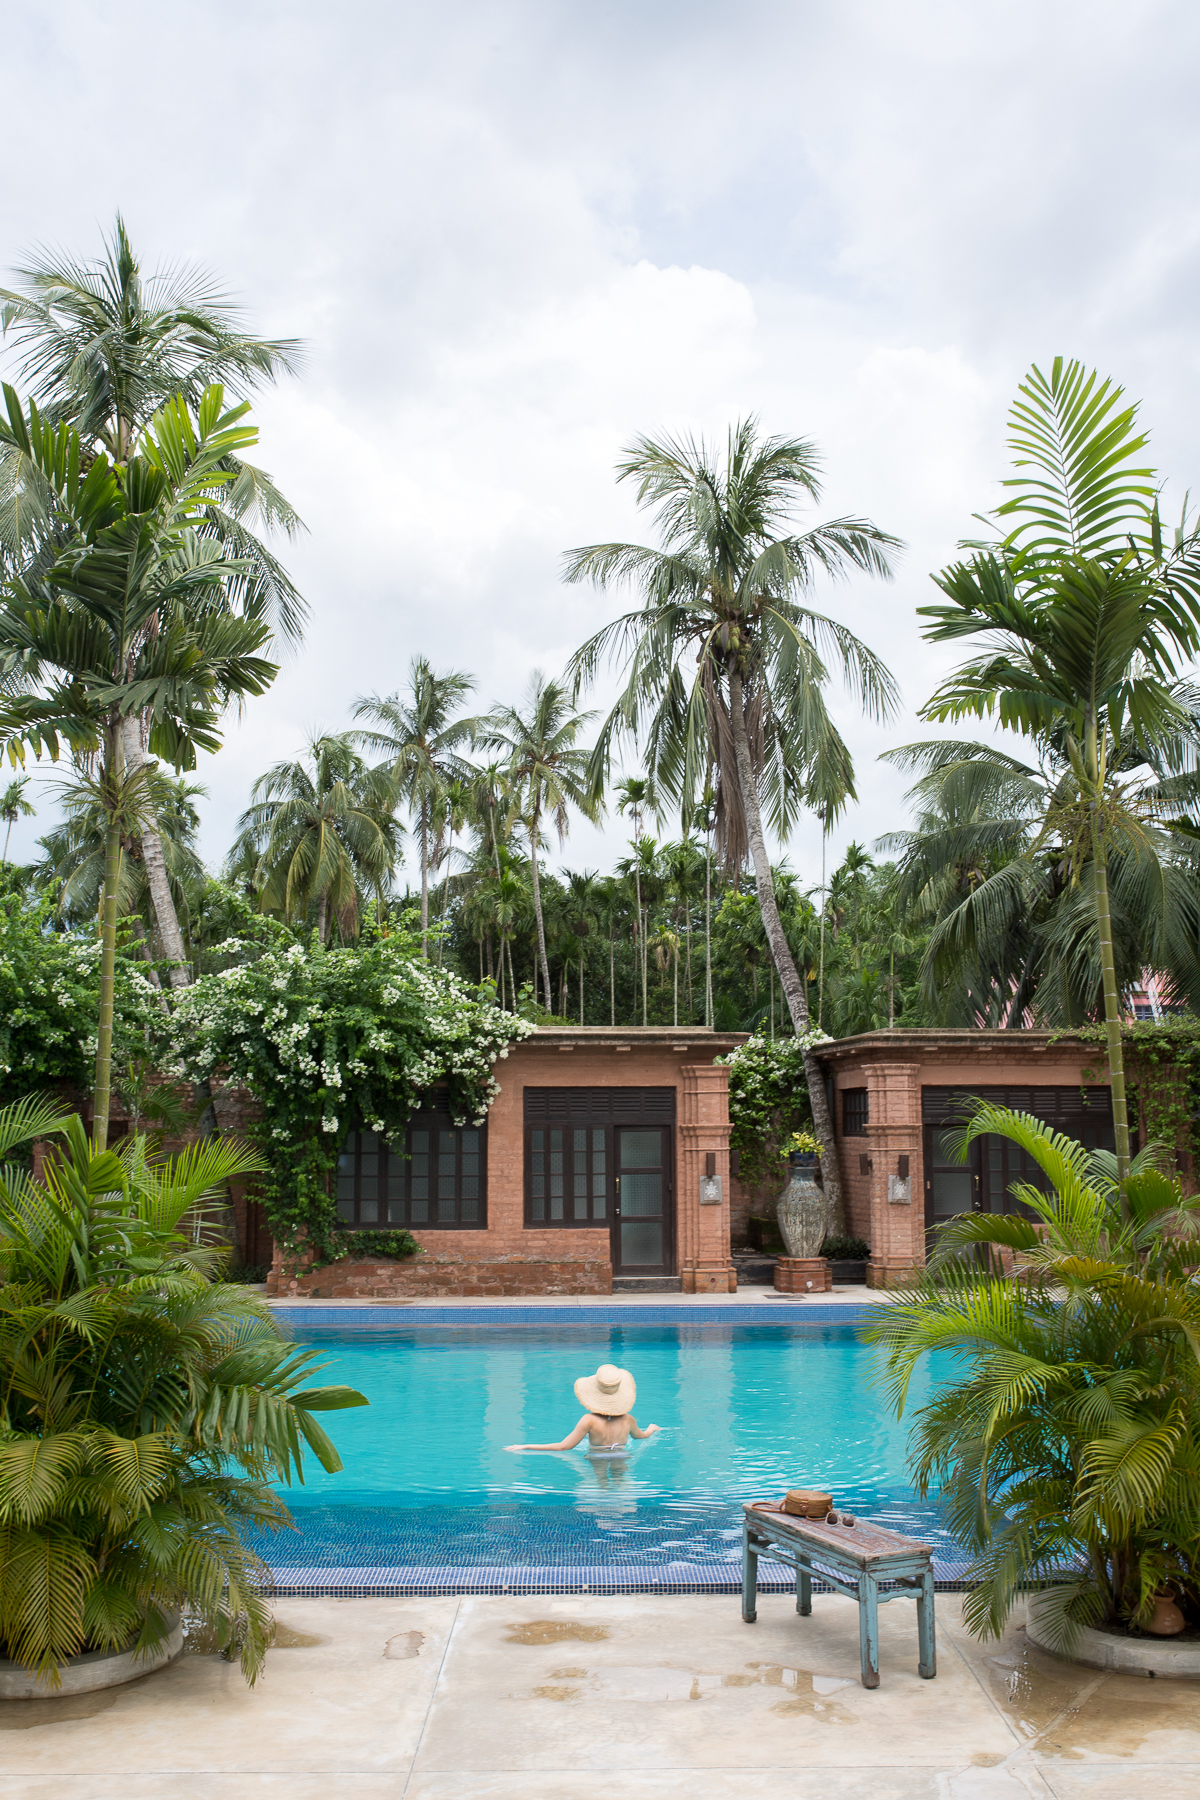 Stacie Flinner The Rajbari Bawali Heritage Hotel Calcutta-63.jpg